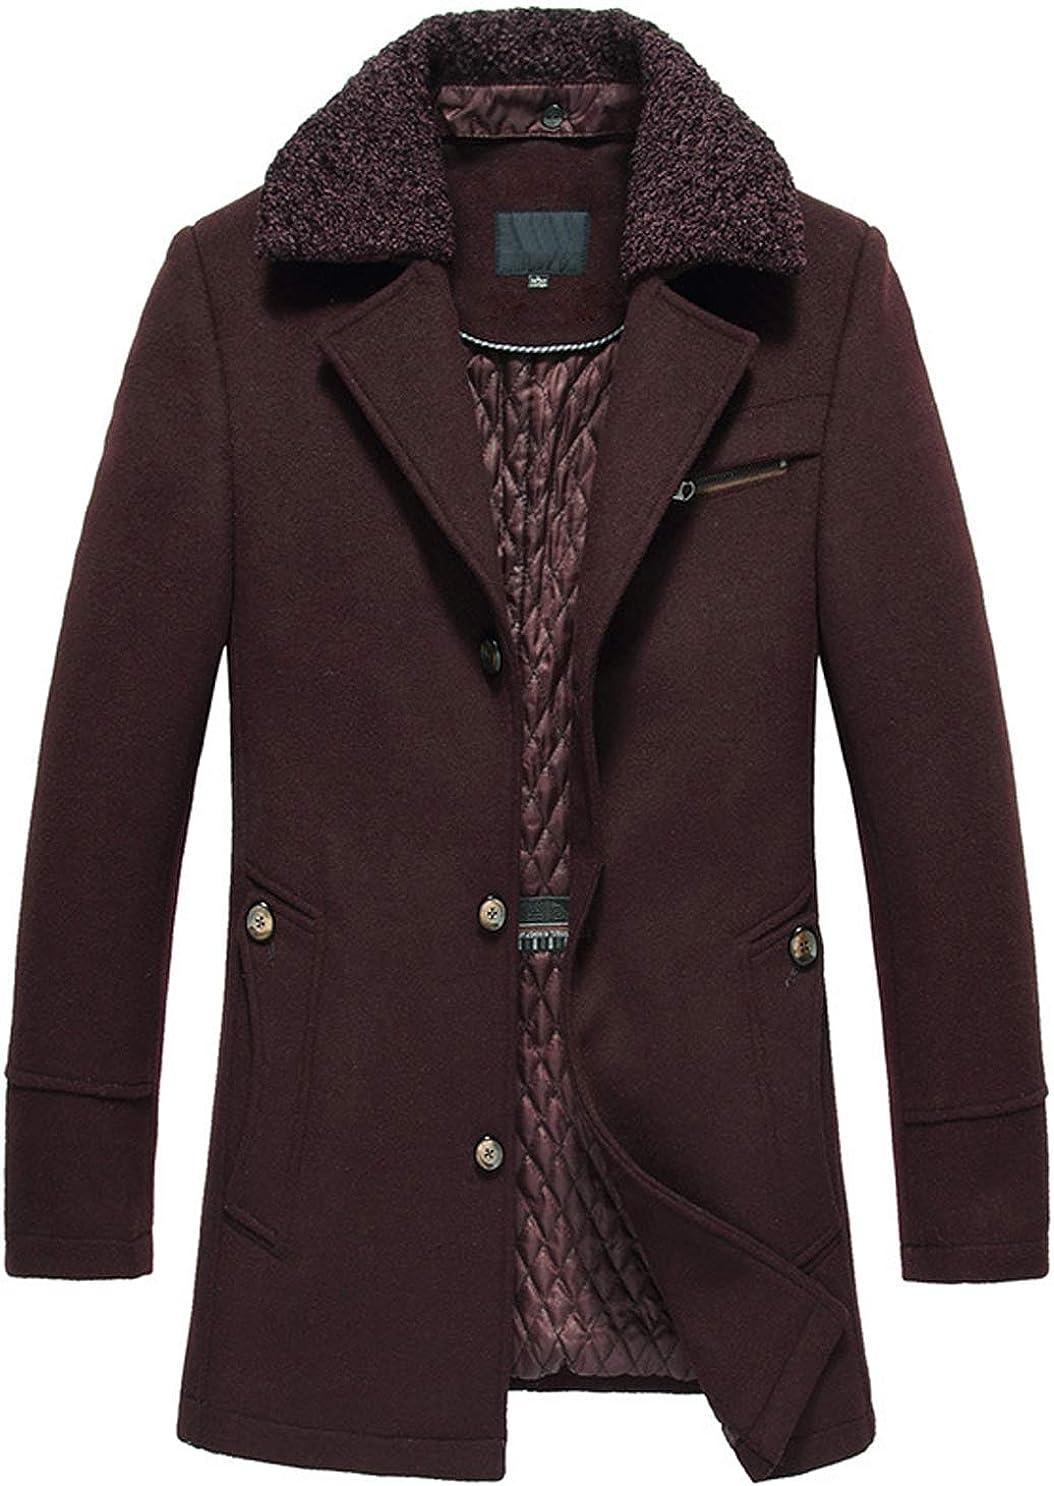 chouyatou Mens Winter Removable Fur Collar Single Breasted Mid Wool Walker Top Coat